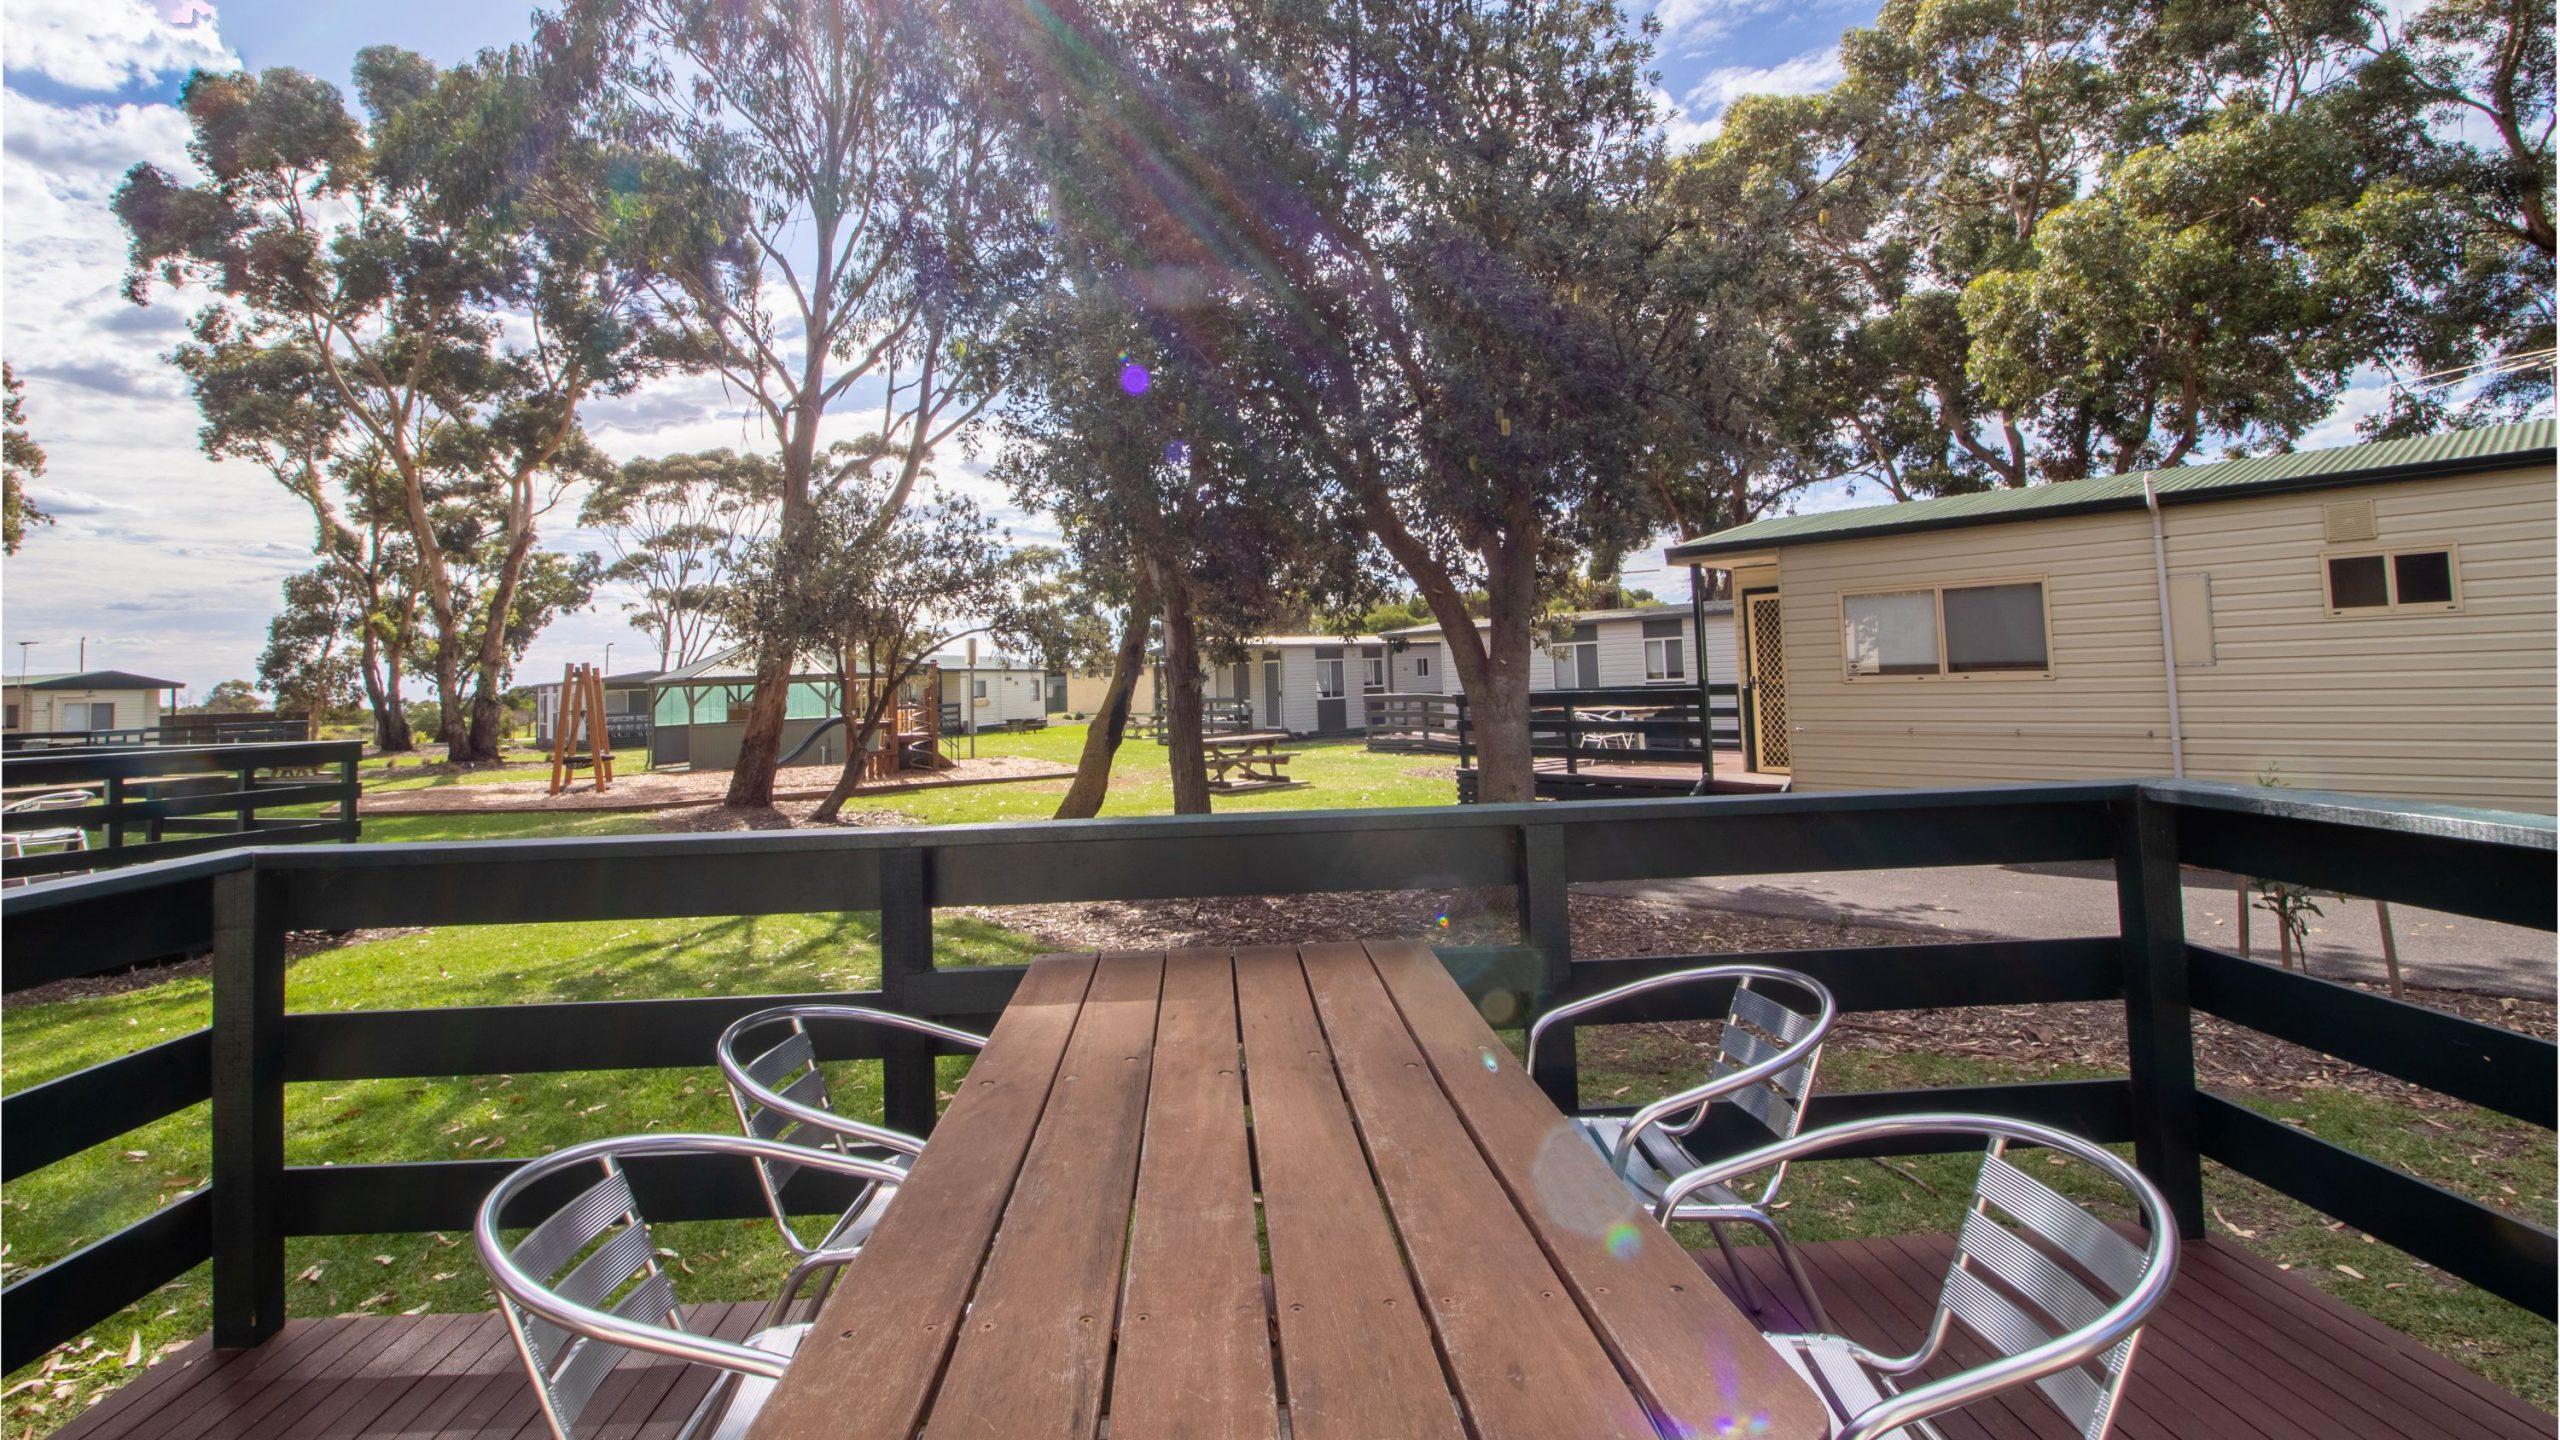 Park Cabin deck